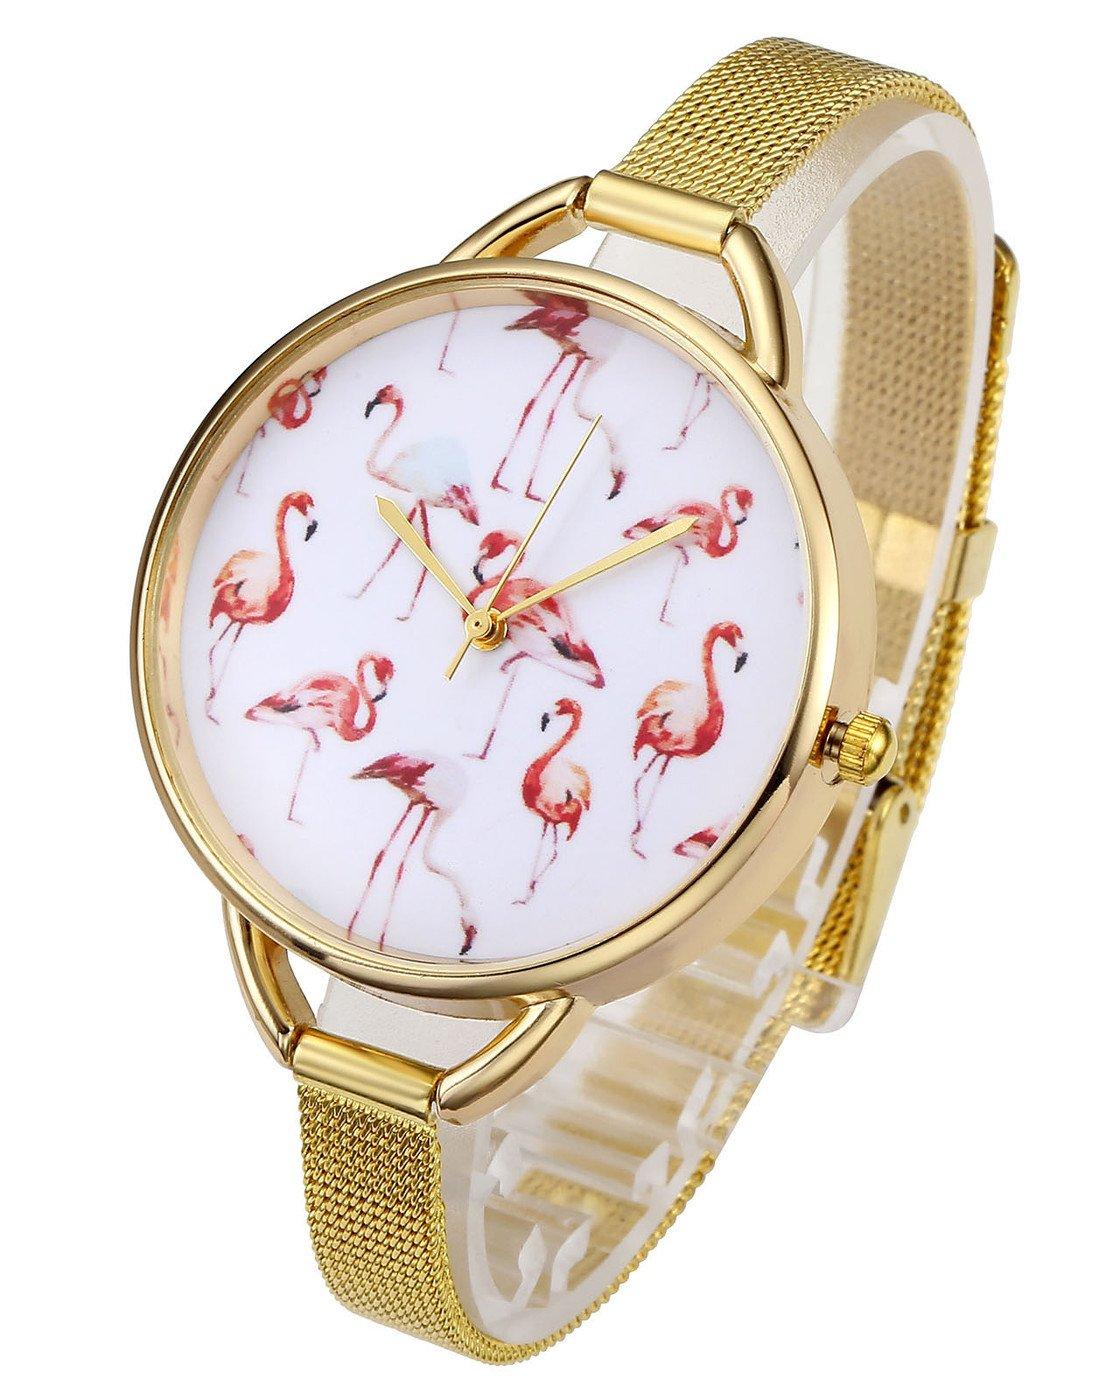 Top Plaza Womens Fashion Gold Tone Analog Quartz Bracelet Wrist Watch, Cute Pink Flamingos Pattern, Mesh Metal Thin Band